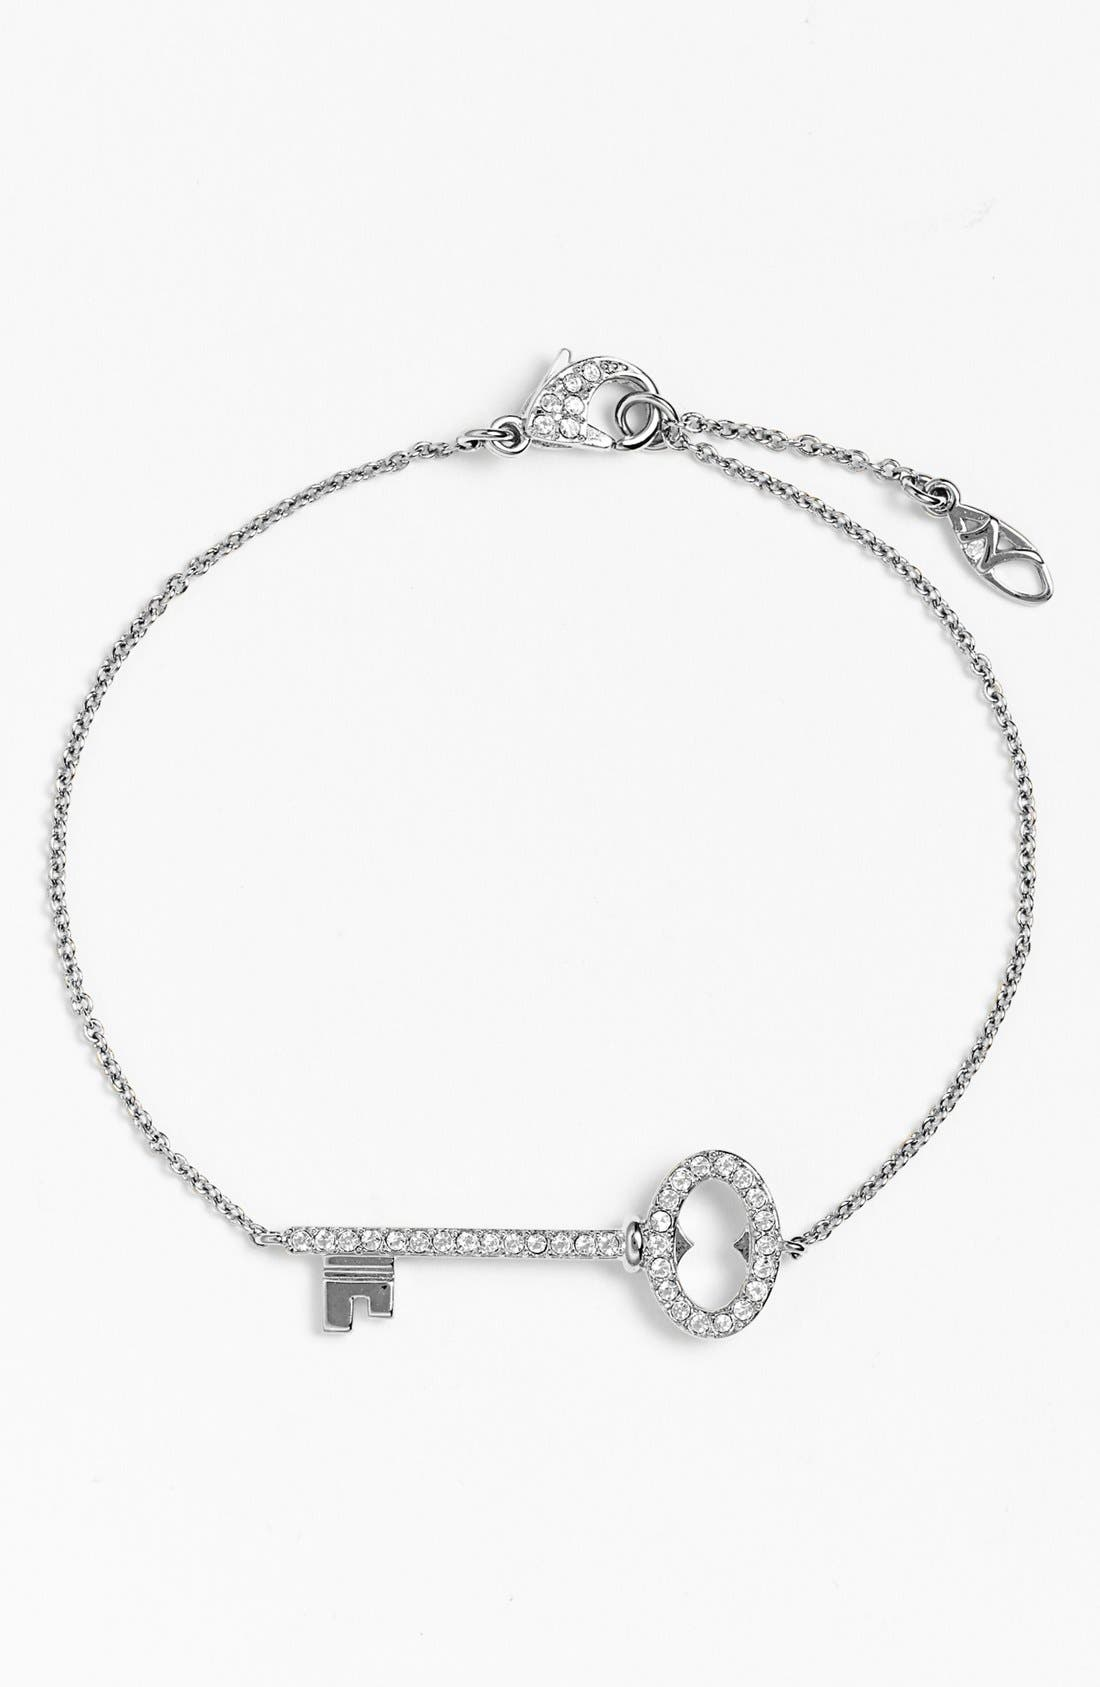 Alternate Image 1 Selected - Nadri Key Station Bracelet (Nordstrom Exclusive)